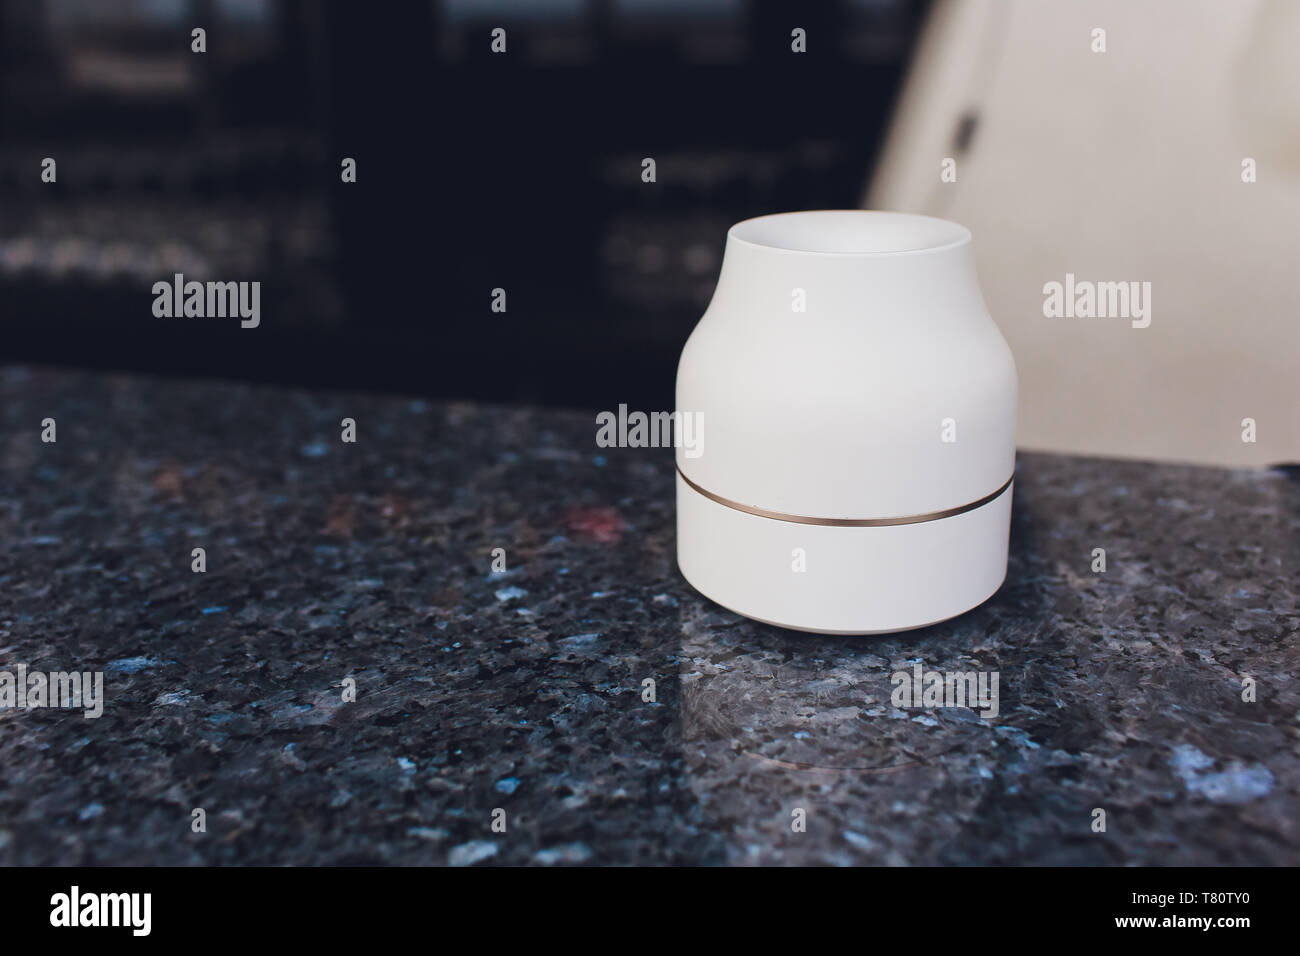 New technology of electronic cigarettes, system of heating stick ashtray - Stock Image